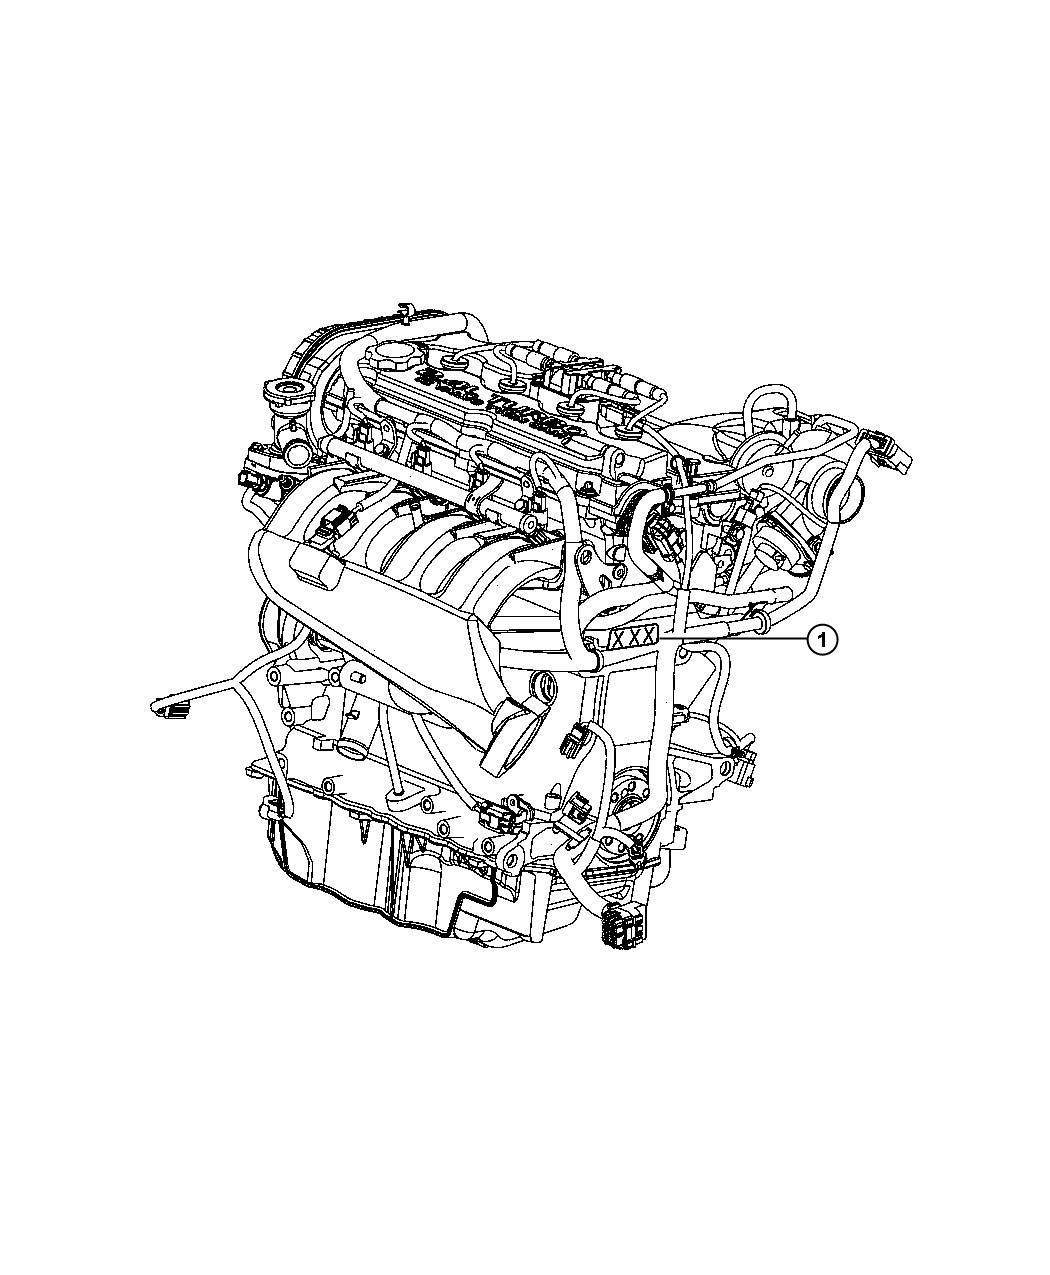 Dodge Neon Engine Long Block Remanufactured Turbo Dohc